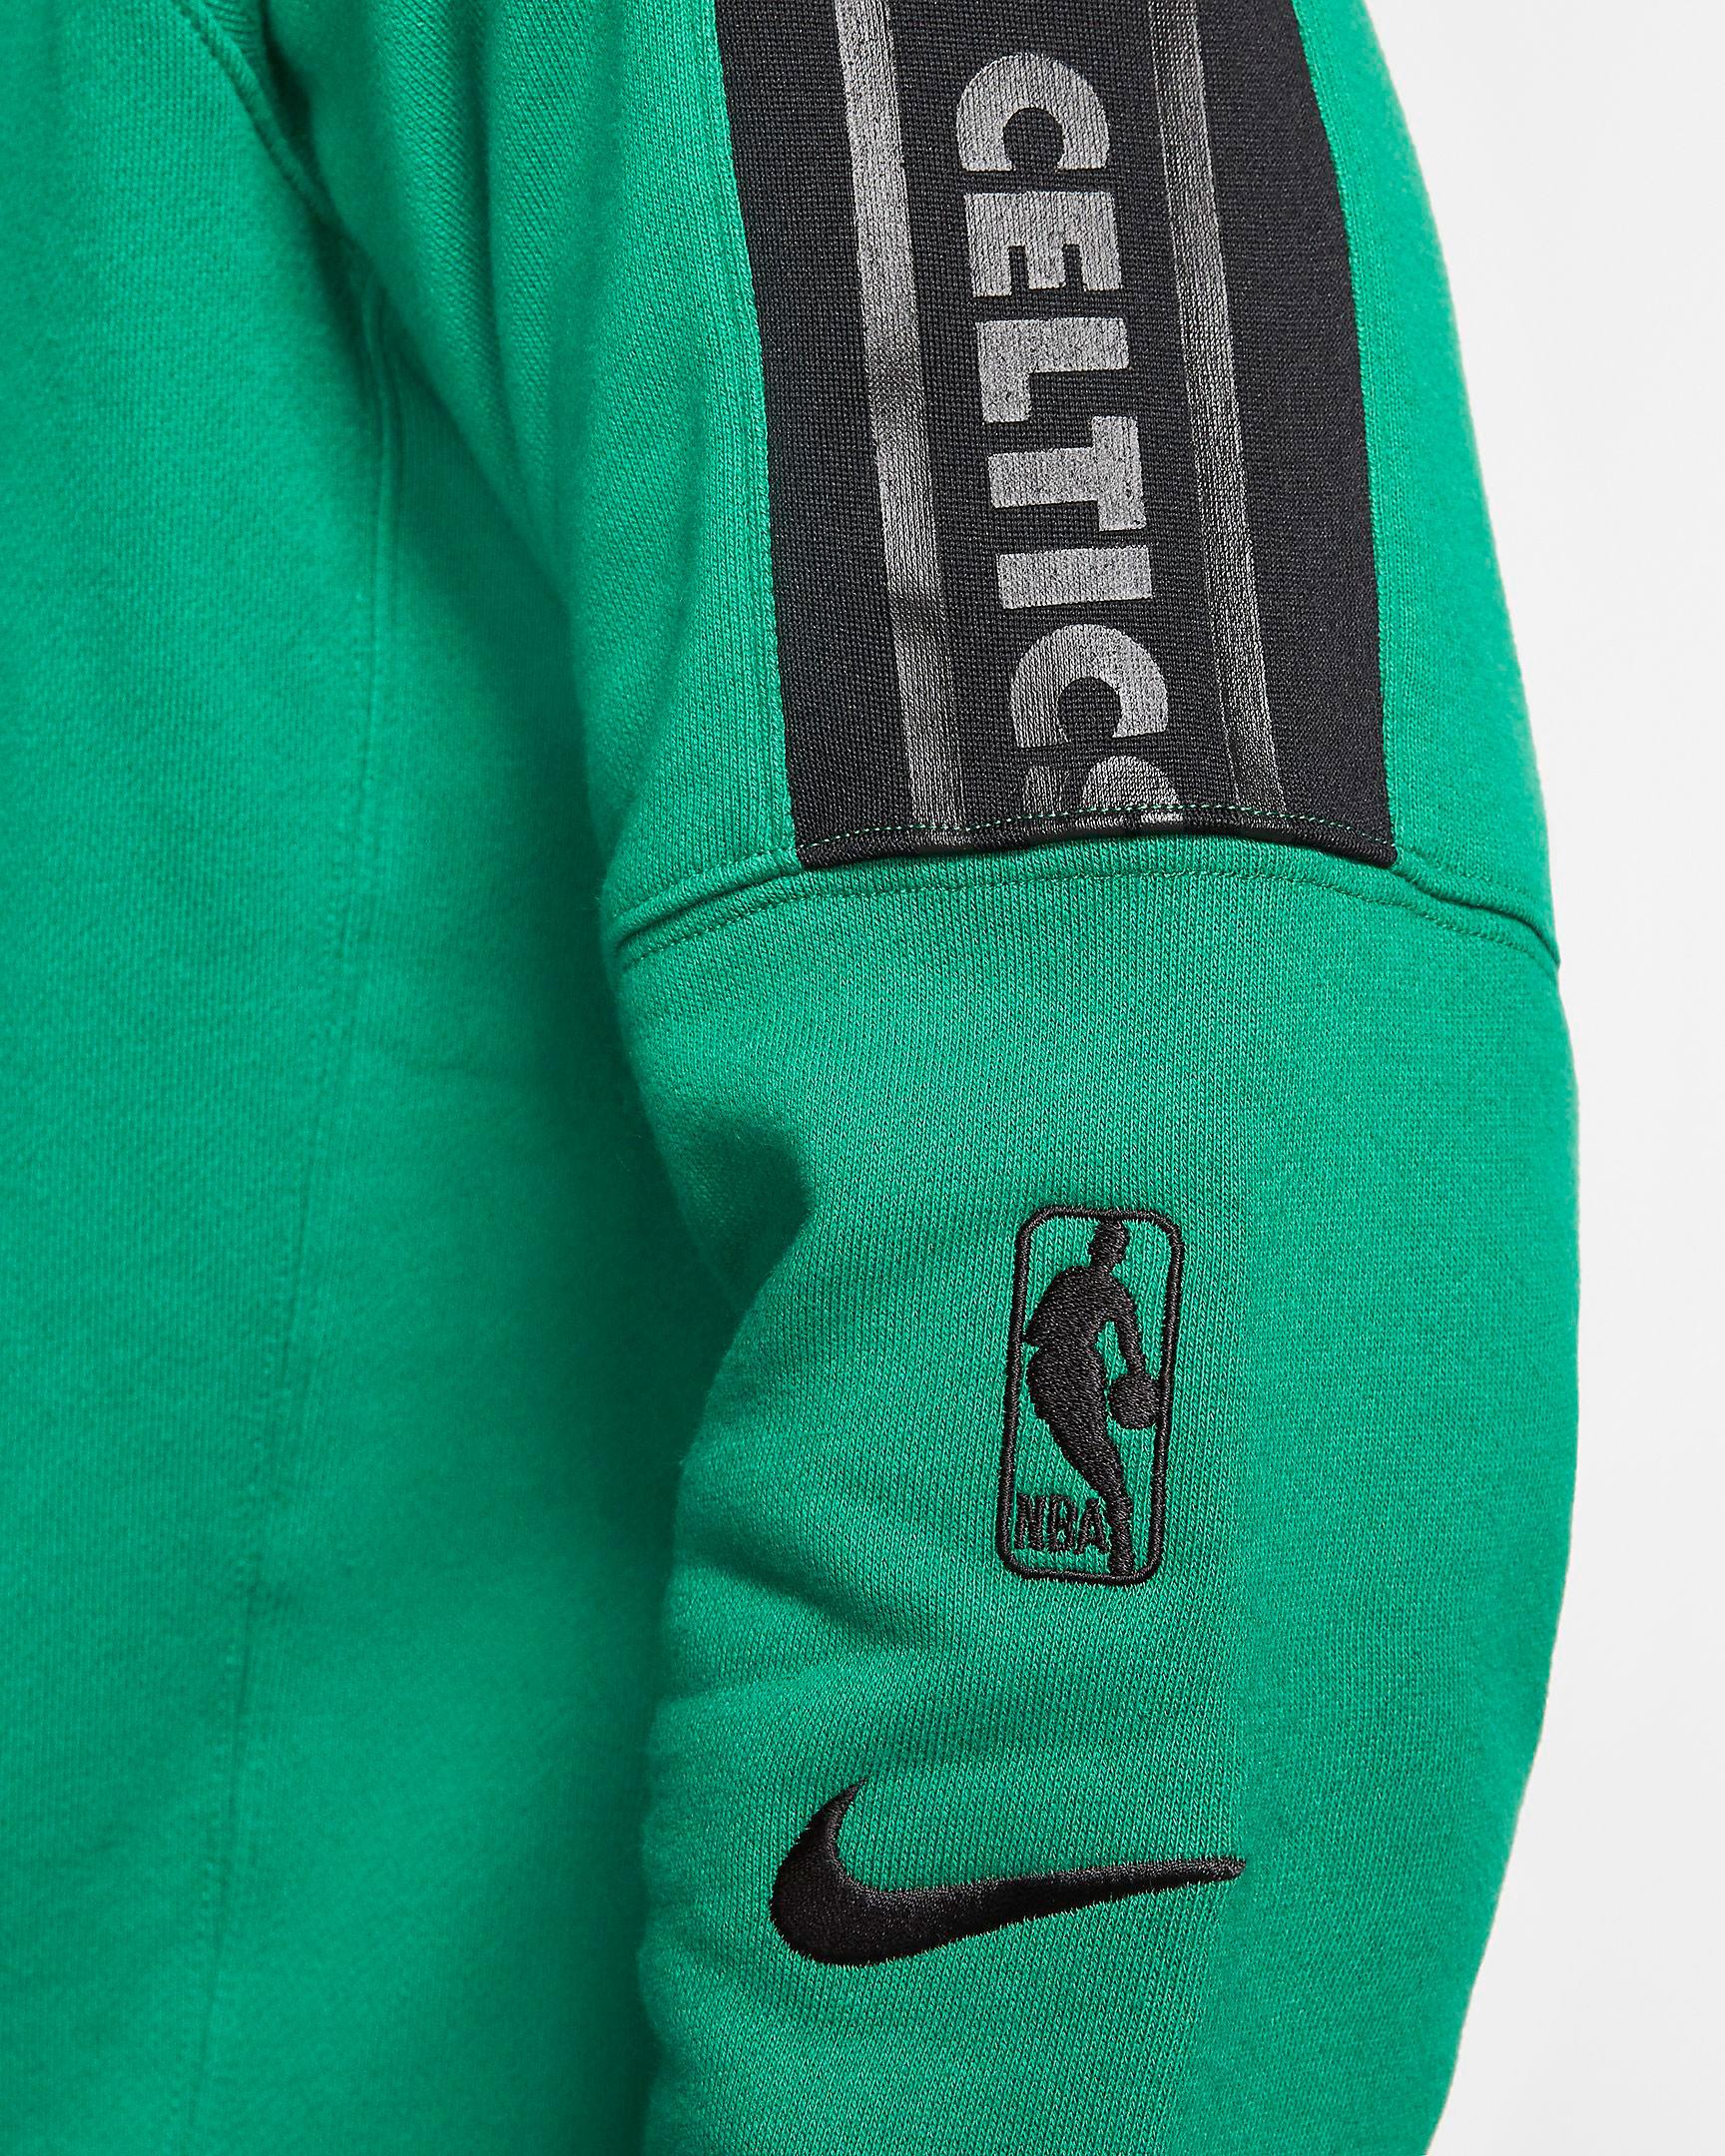 jordan-13-lucky-green-boston-celtics-nike-hoodie-3